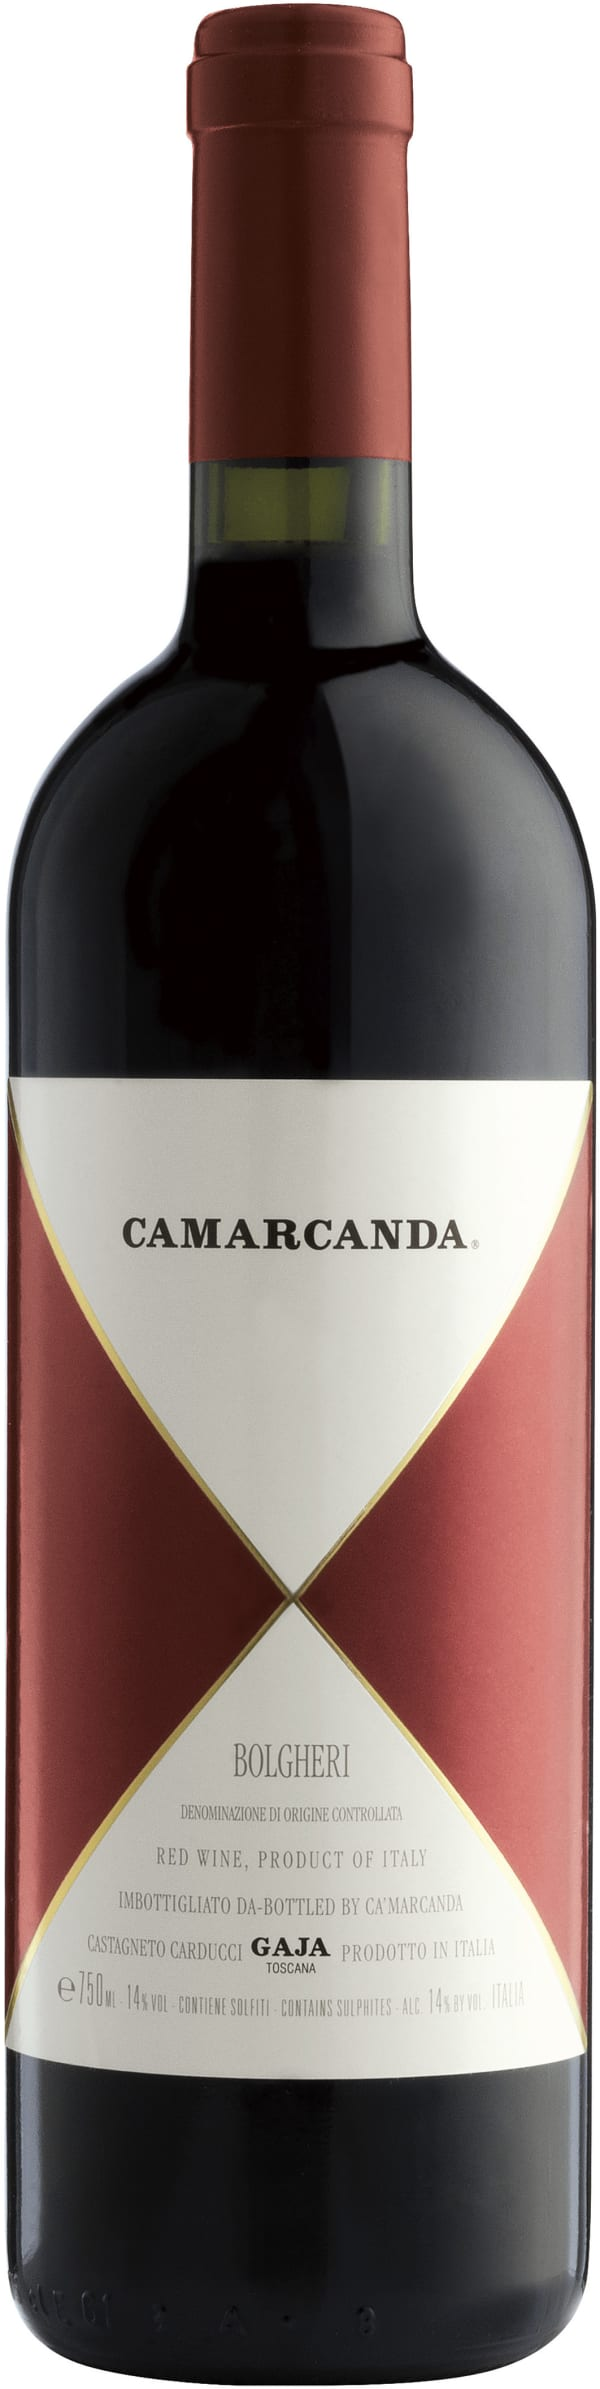 Gaja Camarcanda 2015